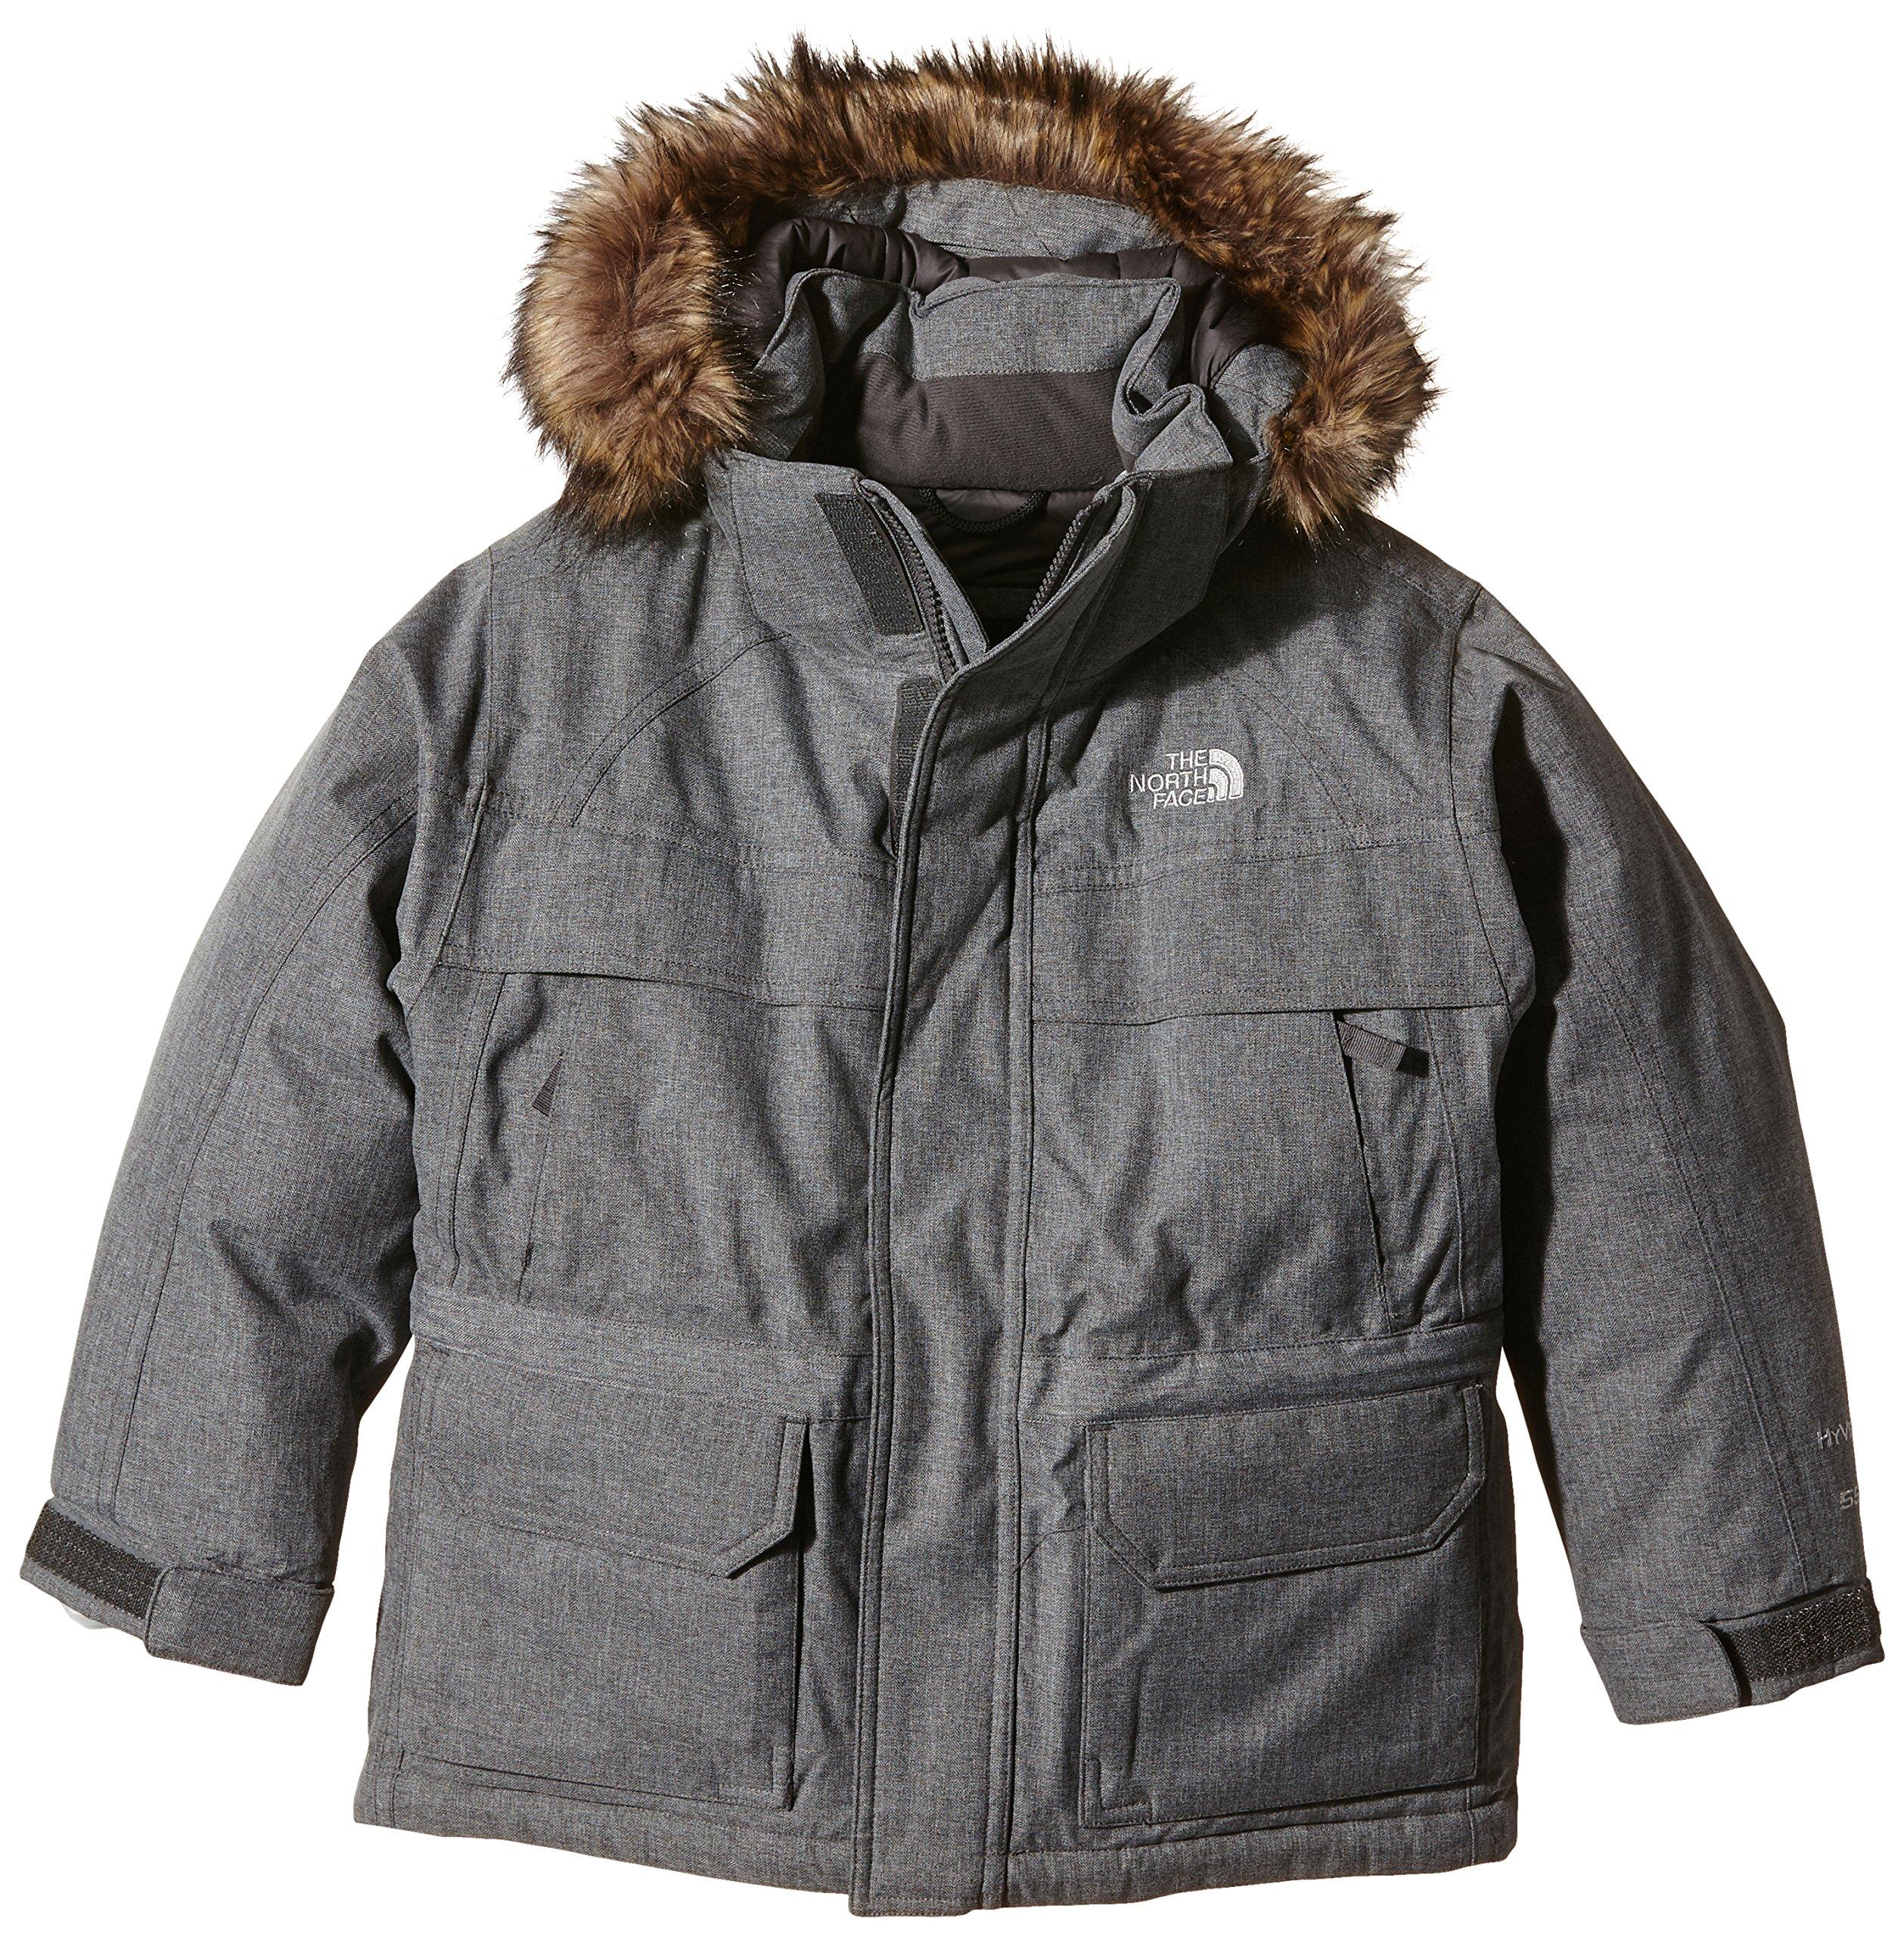 The North Face Kids Boy's McMurdo Down Parka (Little Kids/Big Kids) Charcoal Grey Heather XL (18-20 Big Kids)